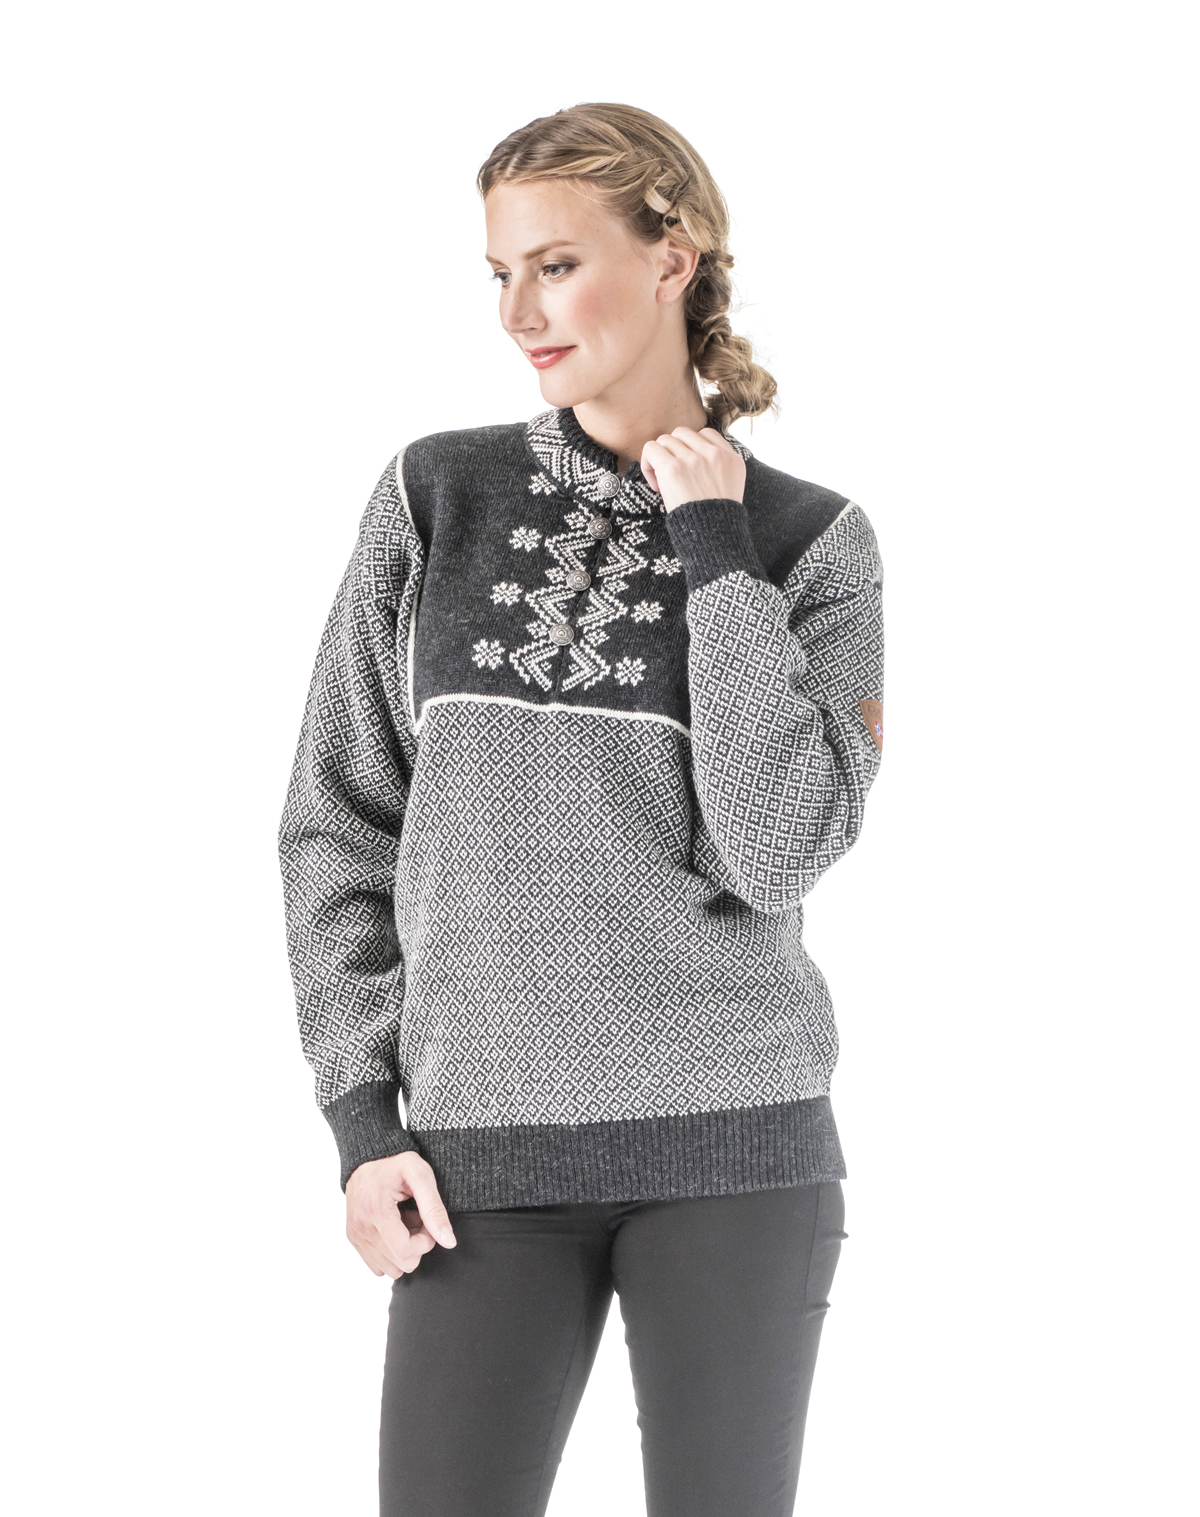 Valdres Unisex Sweater